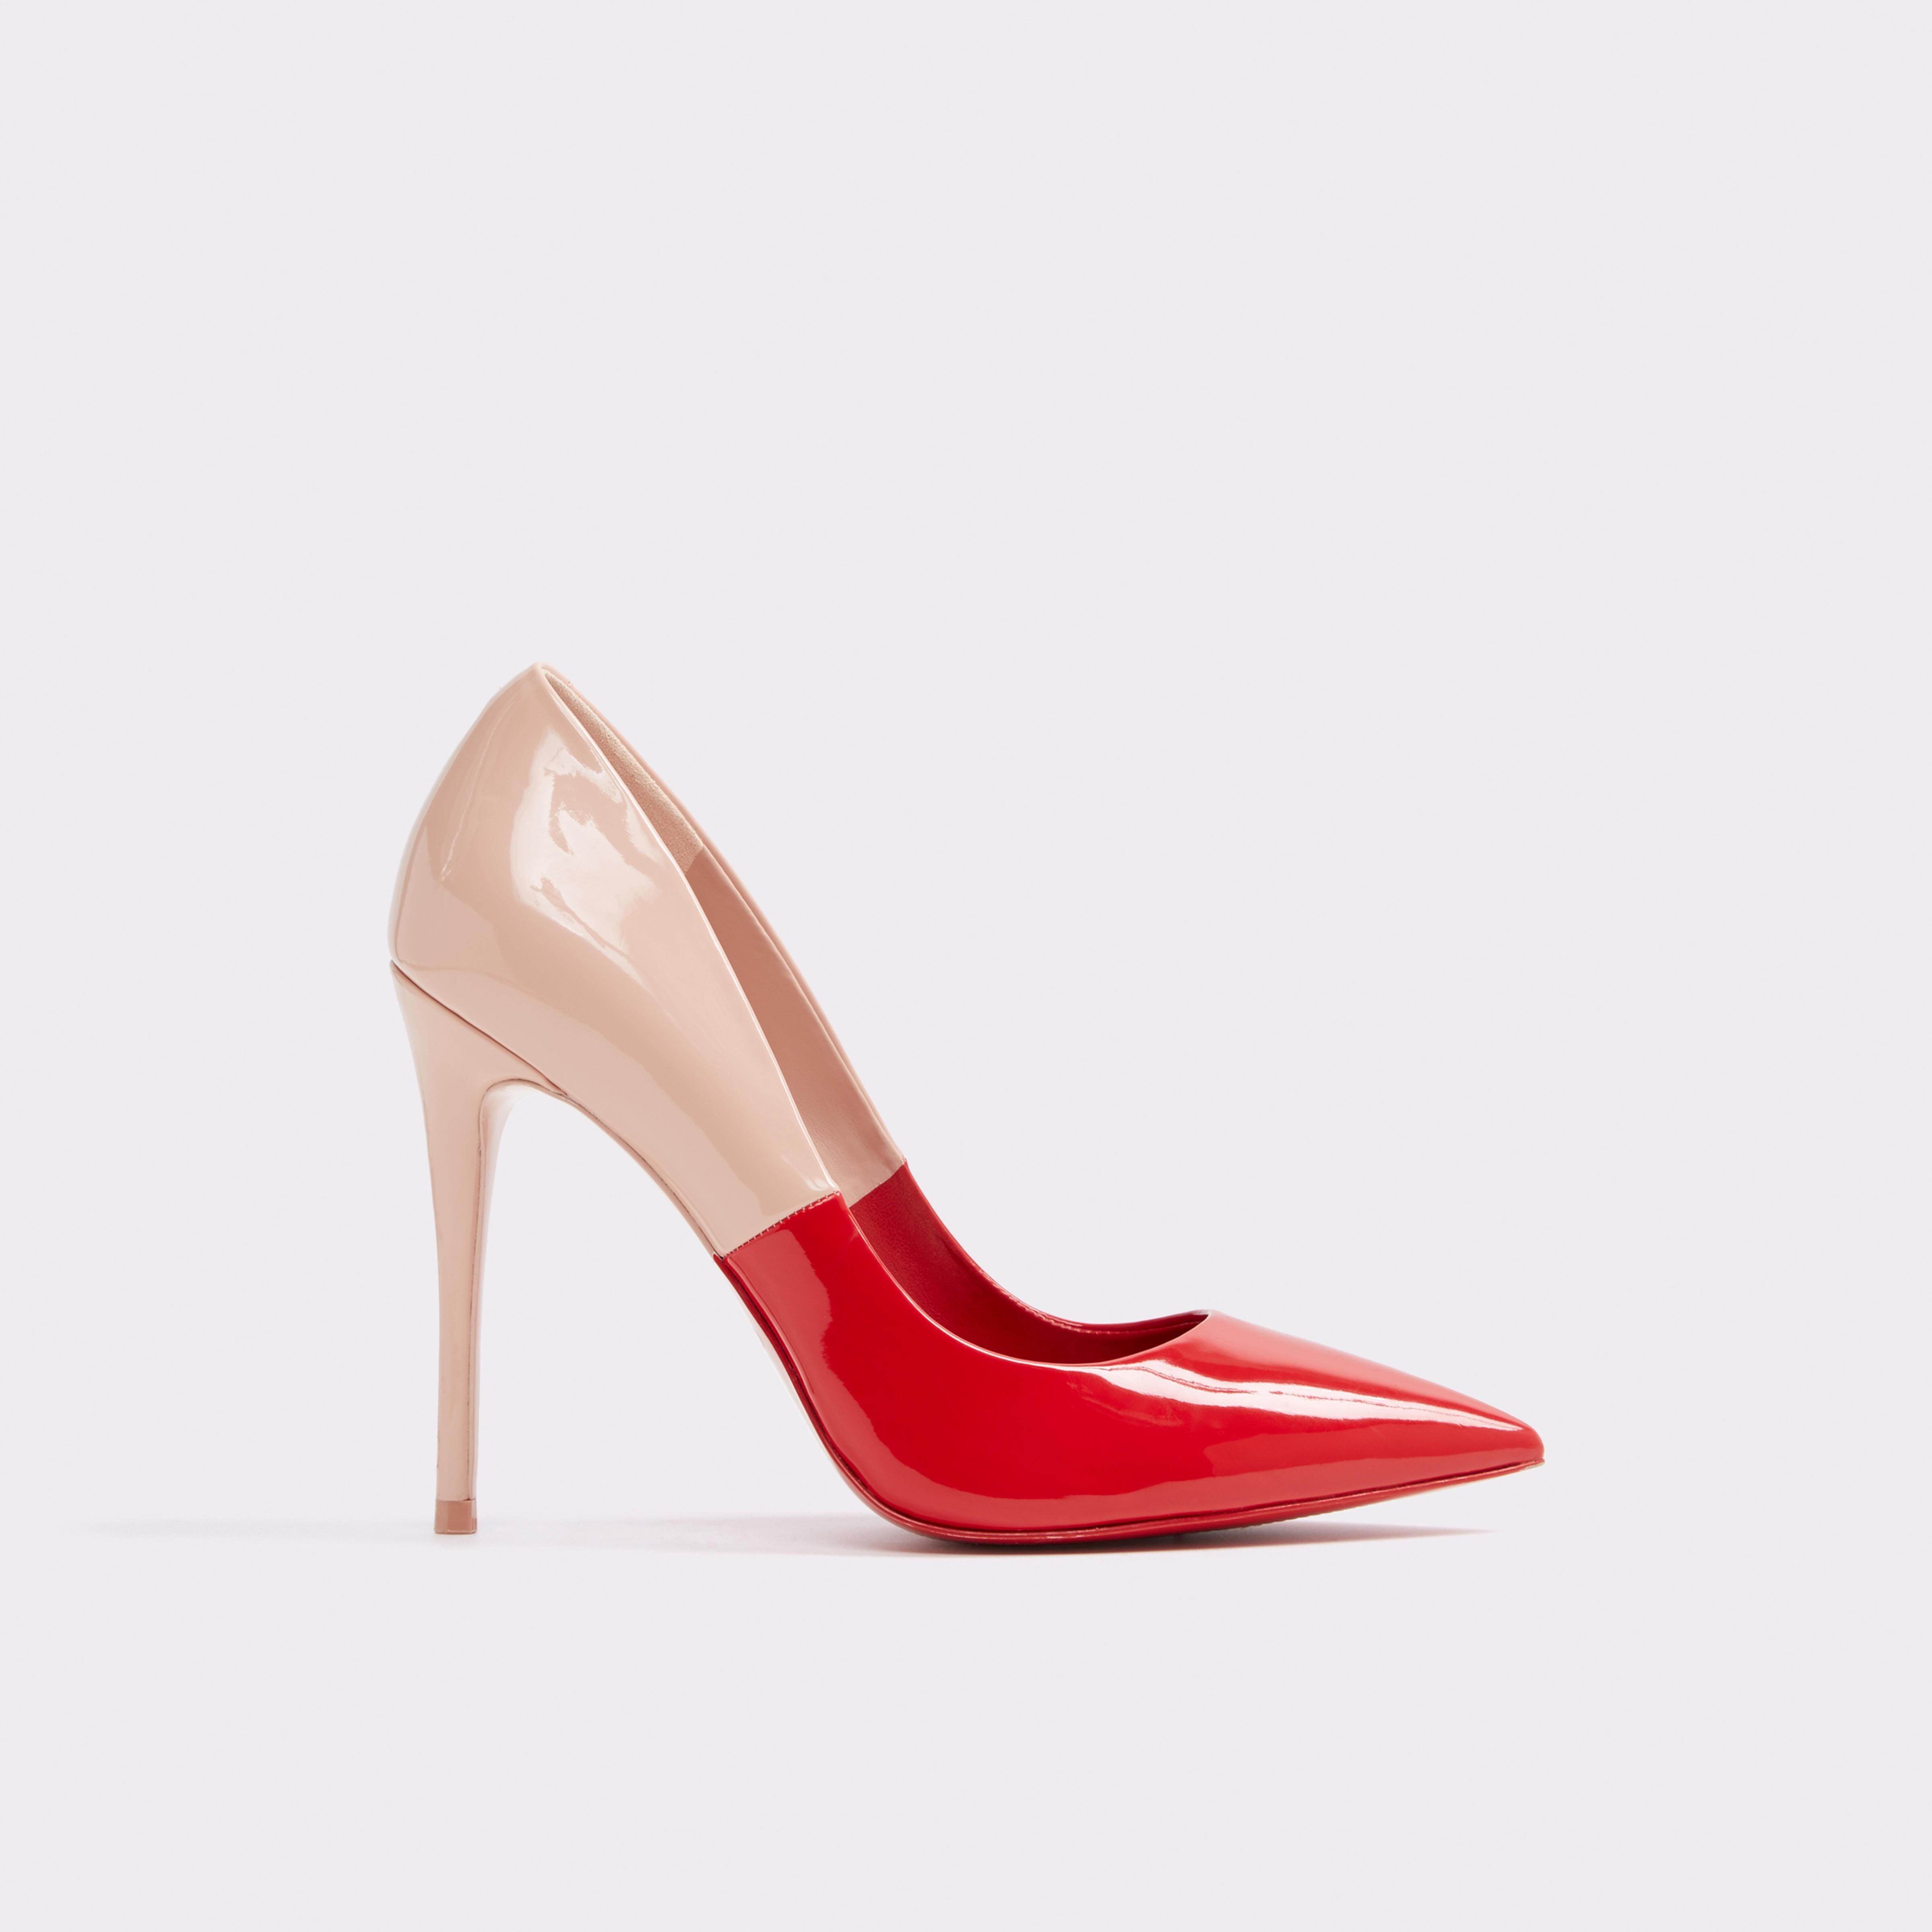 f02151aef5 Aldo Stessy - Red Nubuck 7.5   Products   Shoes, Heels, Aldo shoes